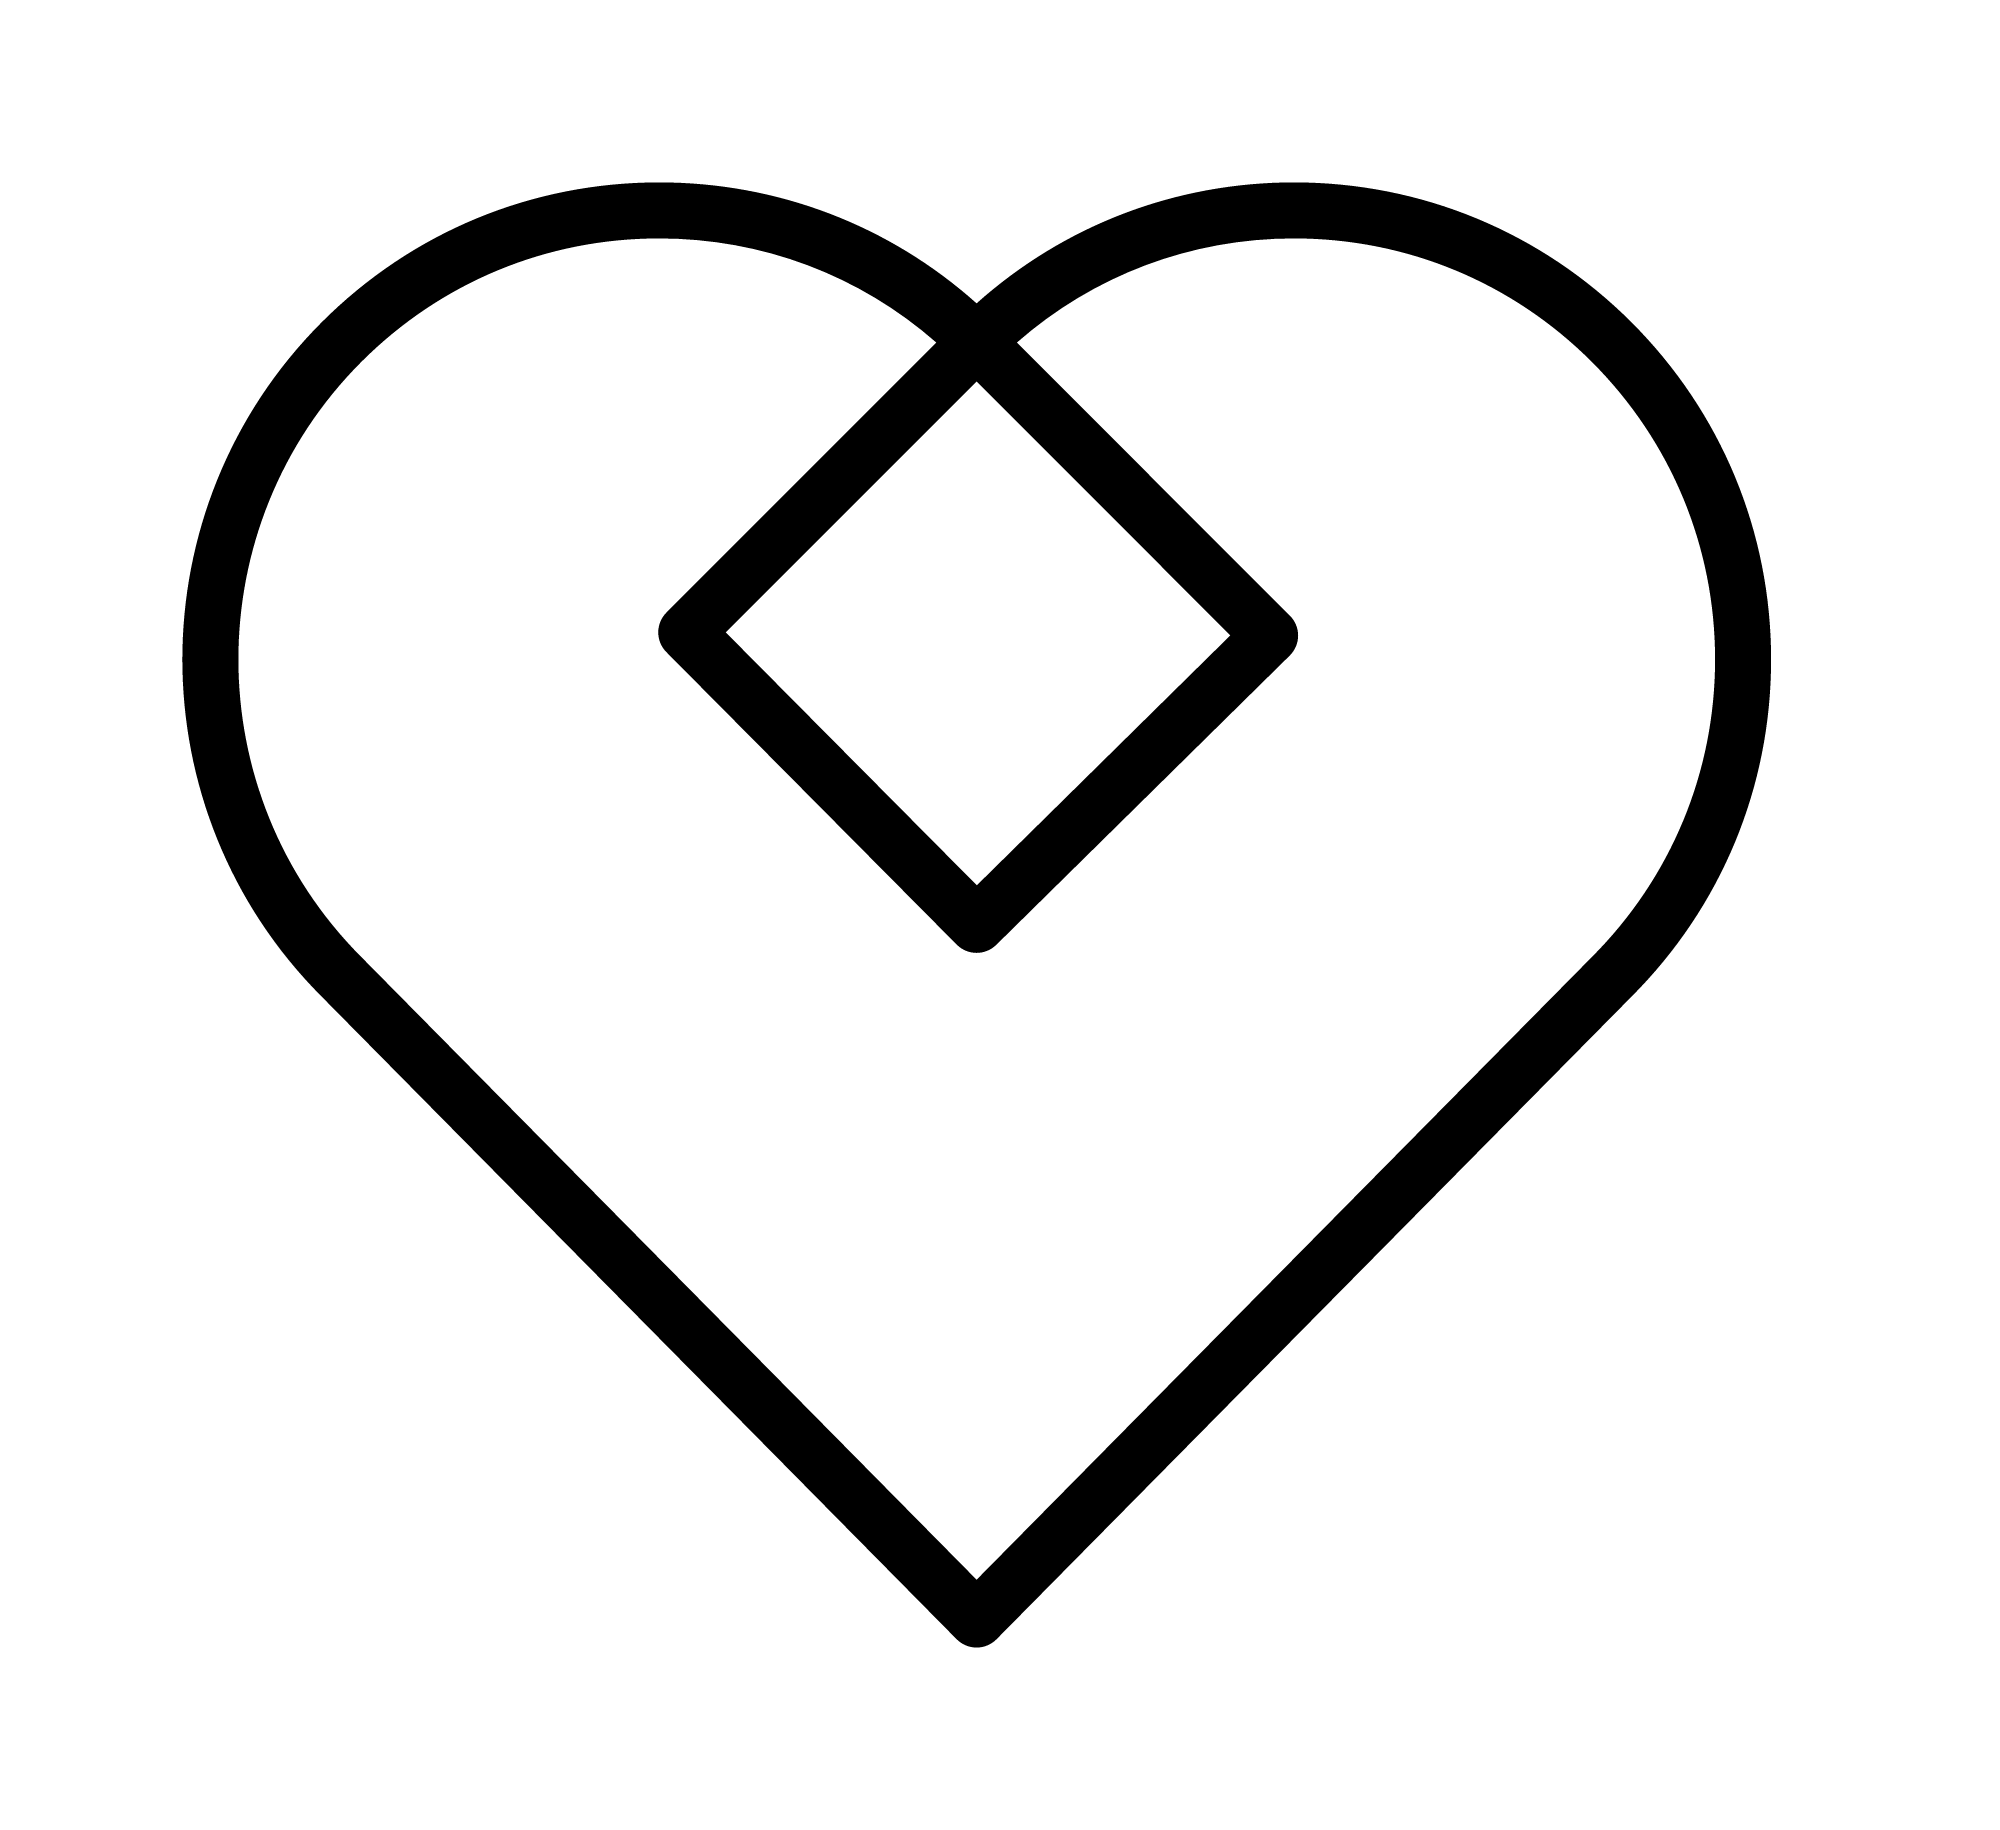 Go to Shortgirl Shortbread's profile